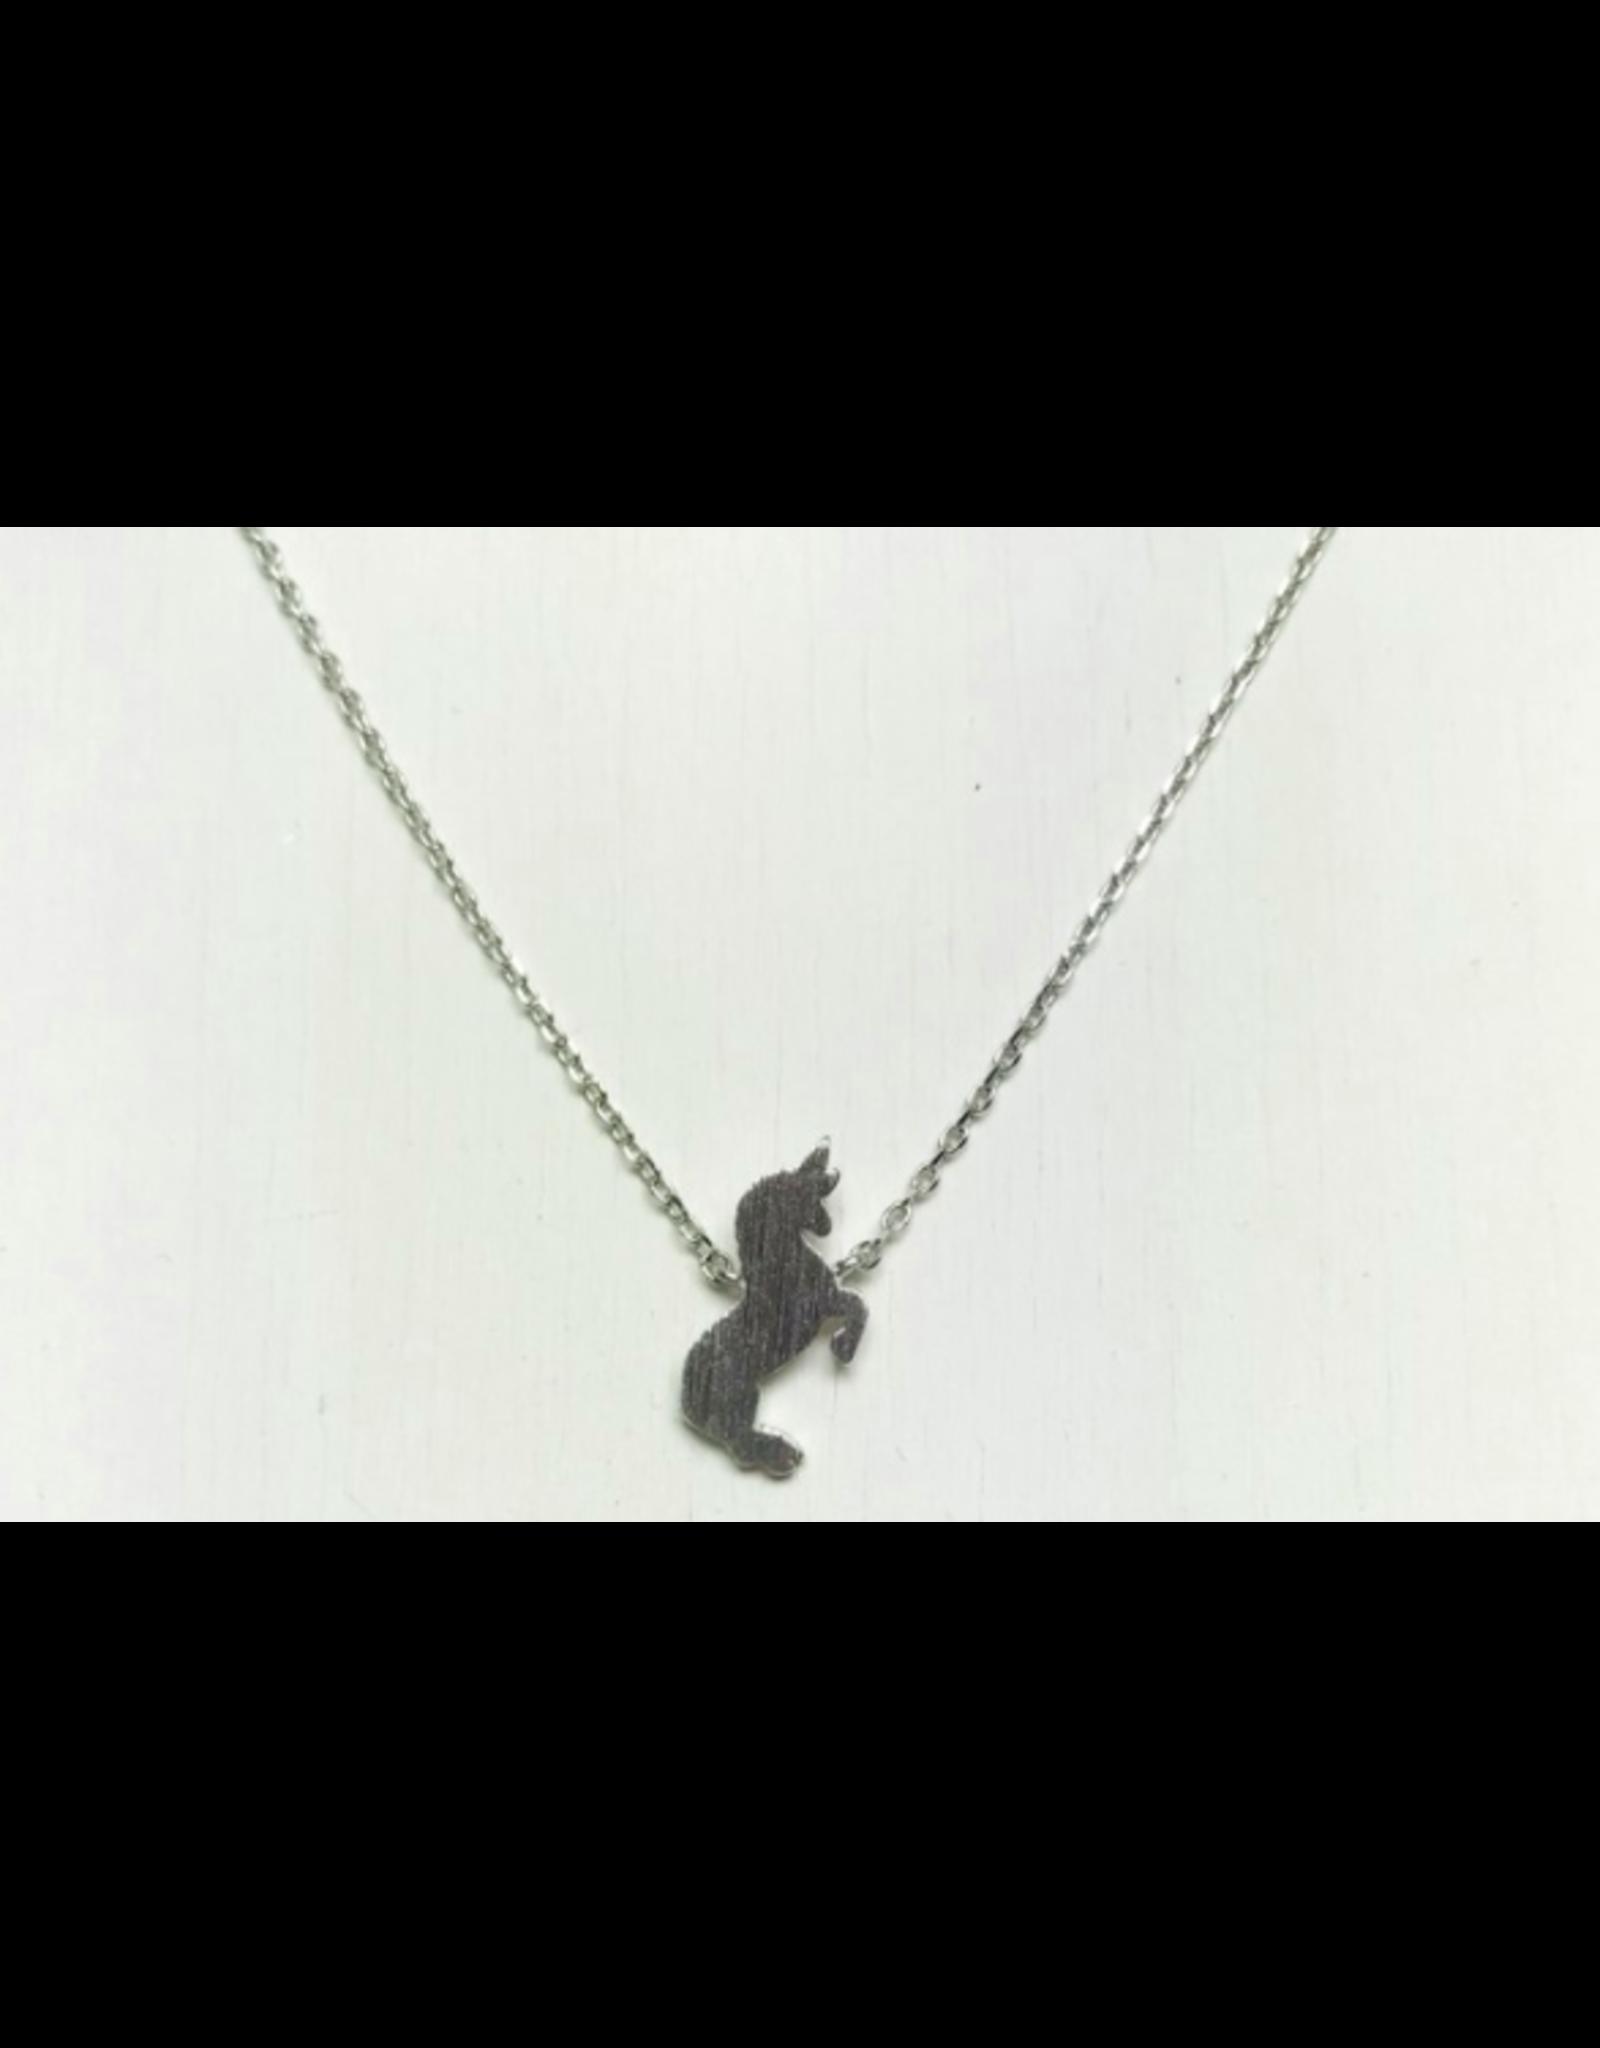 Unicorn Necklace in Silver